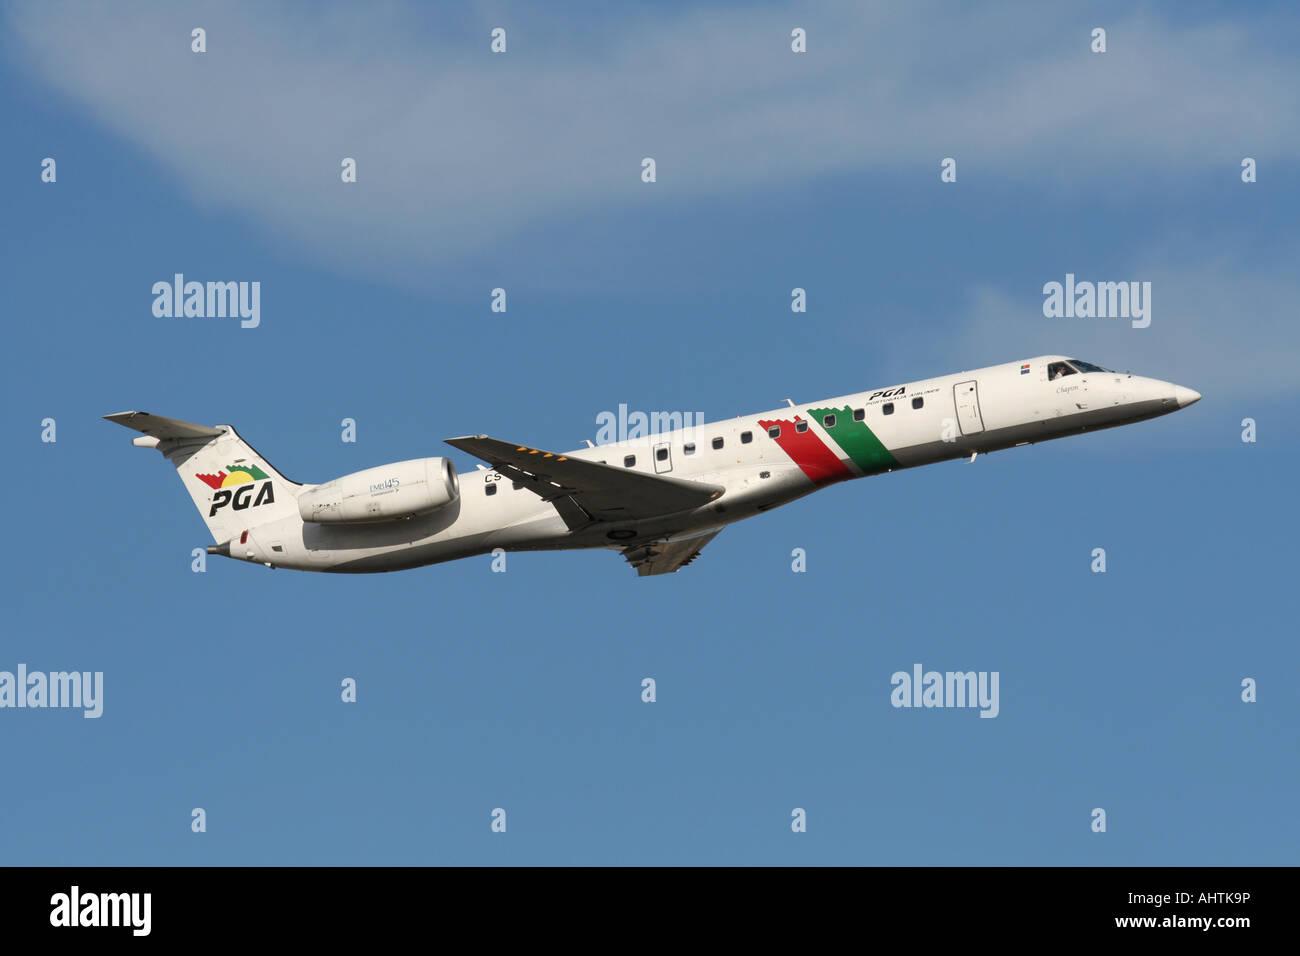 PGA Portugalia Embraer ERJ 145 regional airliner on departure - Stock Image